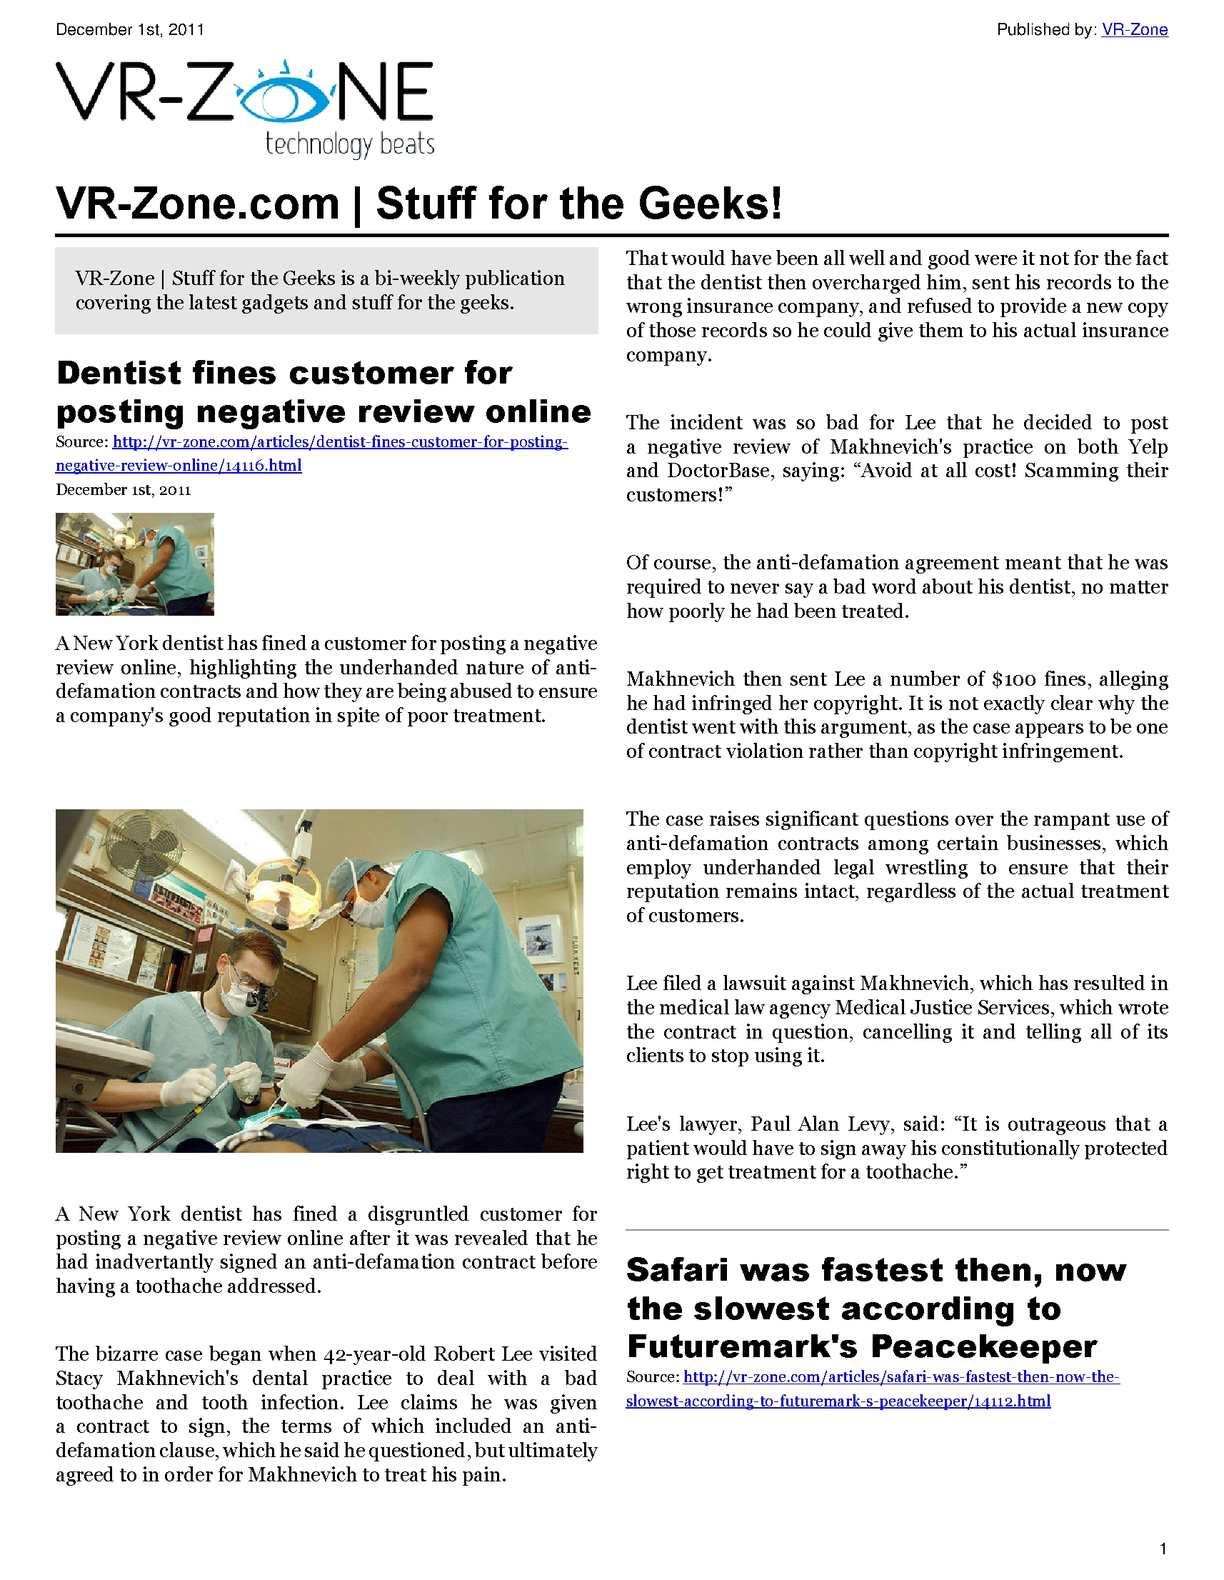 Calamo Vr Zone Tech News For The Geeks Dec 2011 Issue Evos Red White Thunder Tshirt Merah S